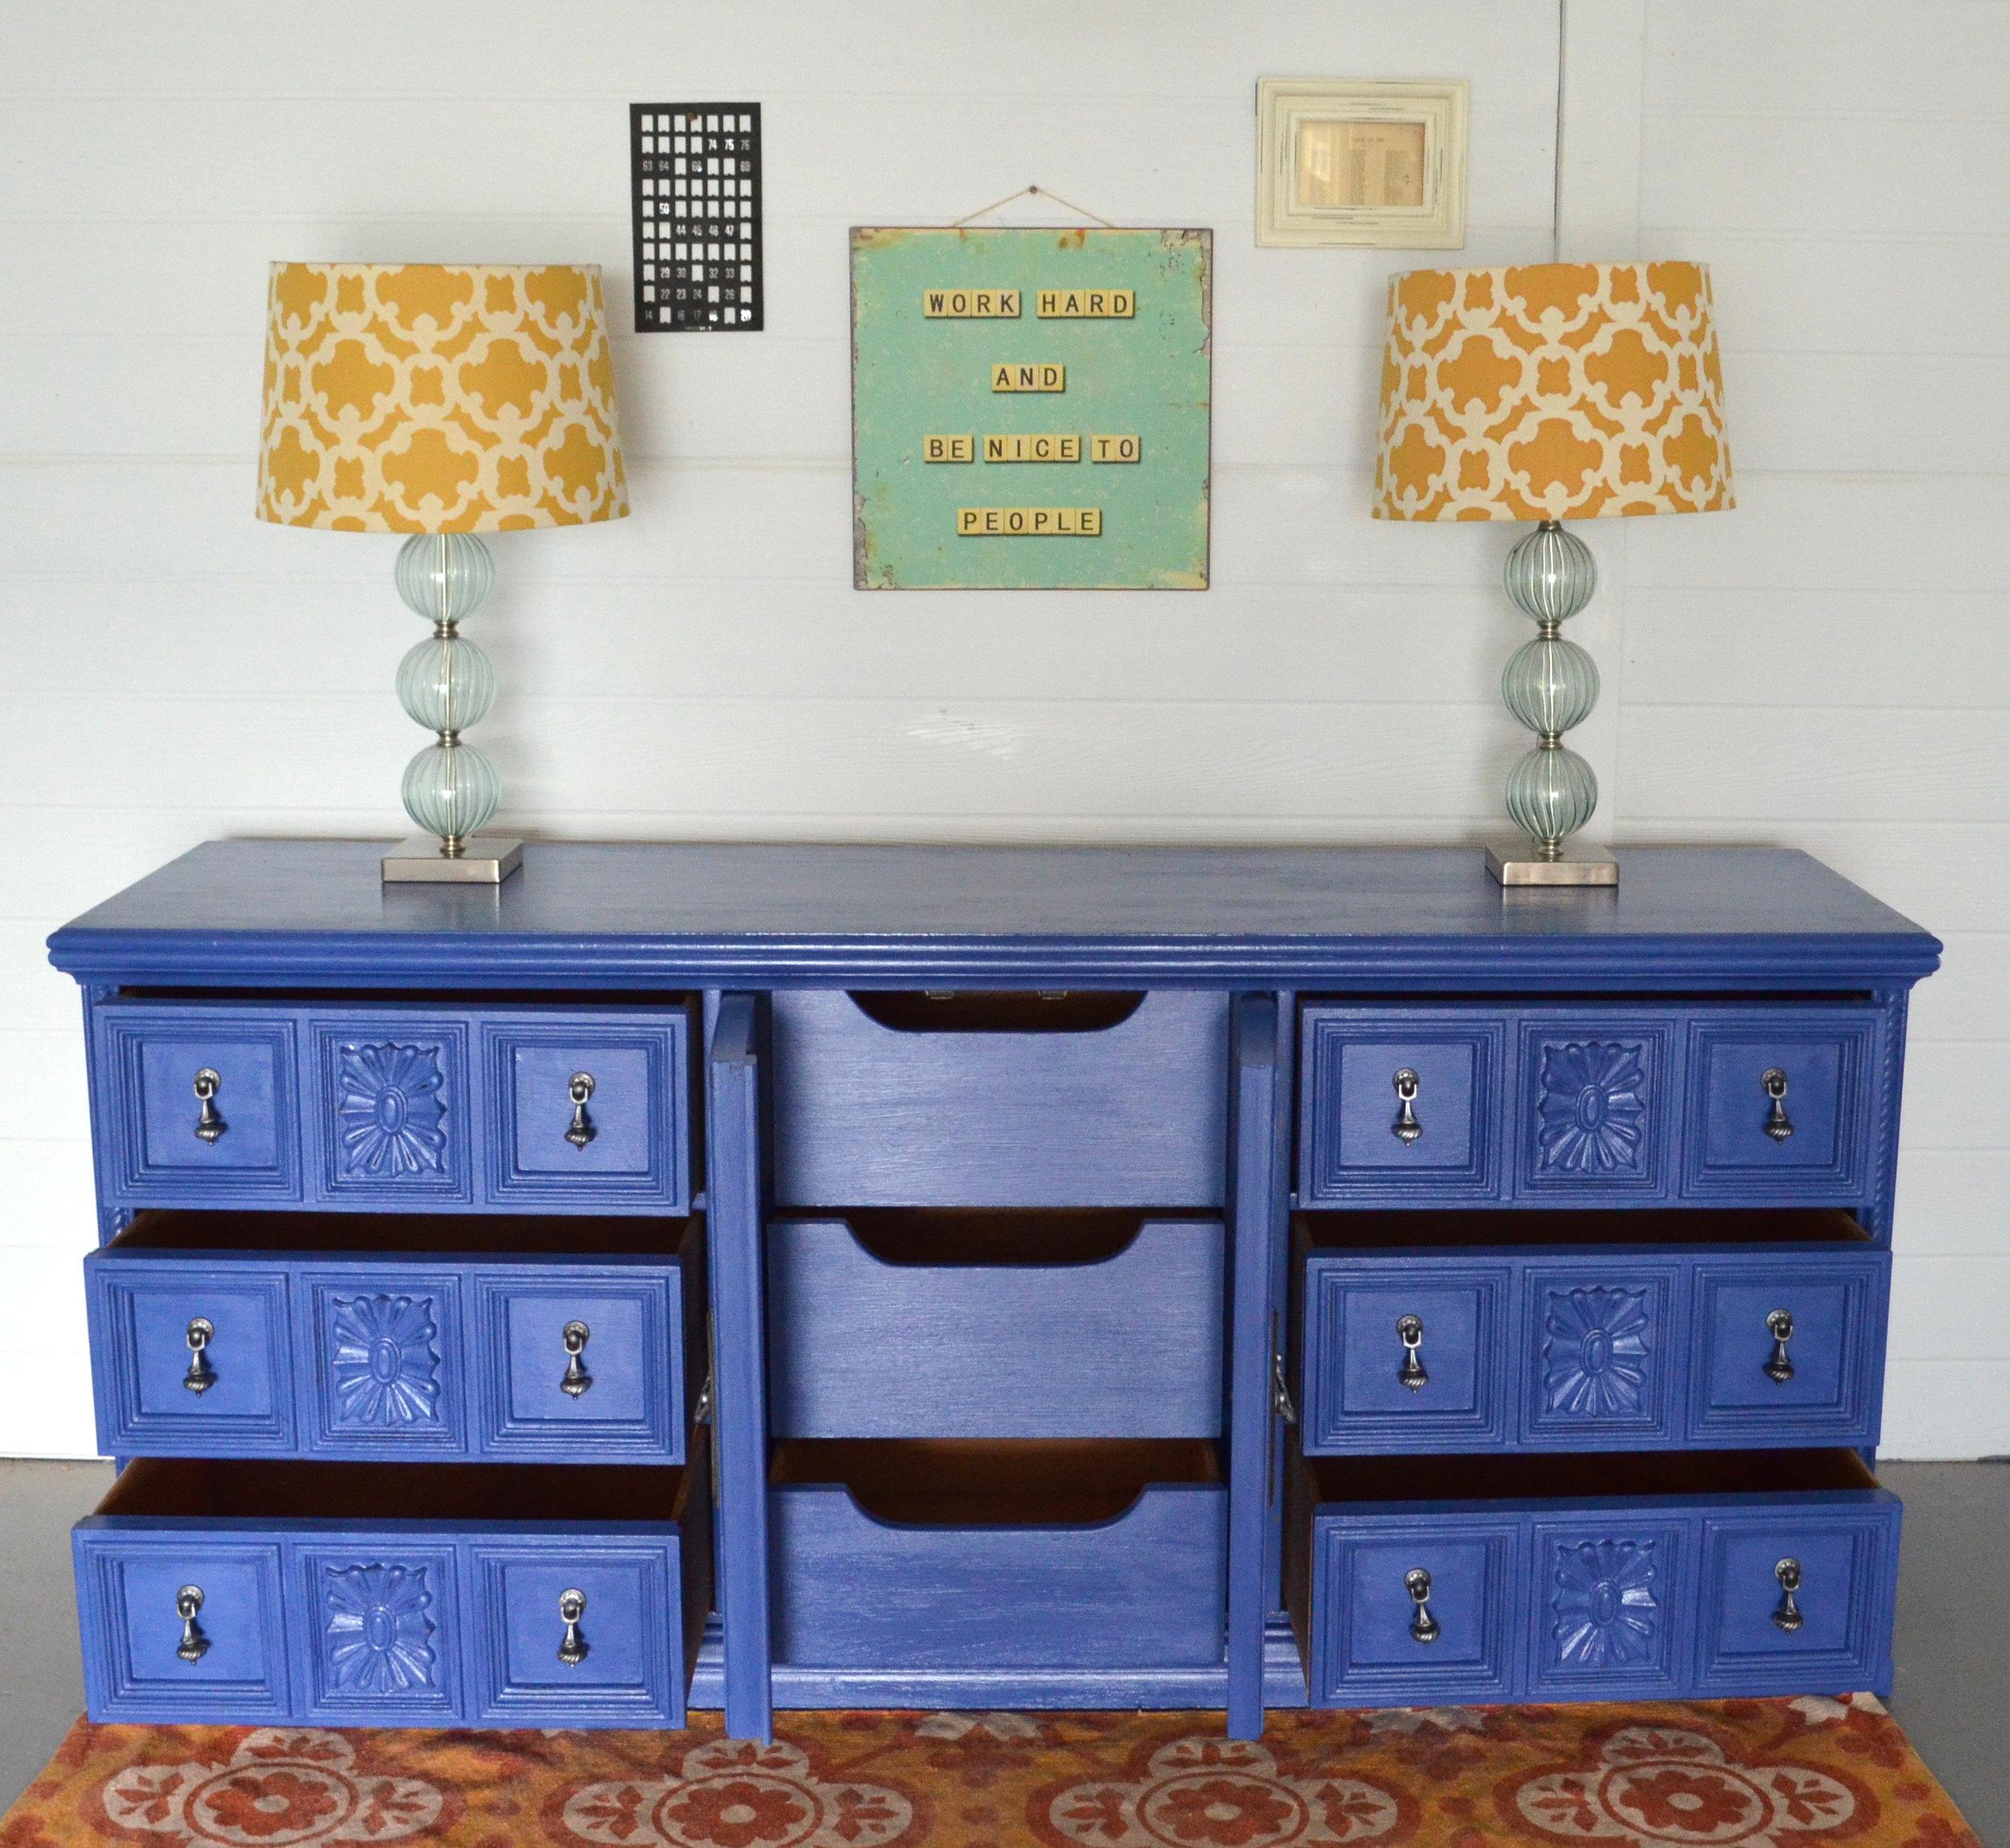 CeCe Caldwell Maine Harbor Blue Dresser 5